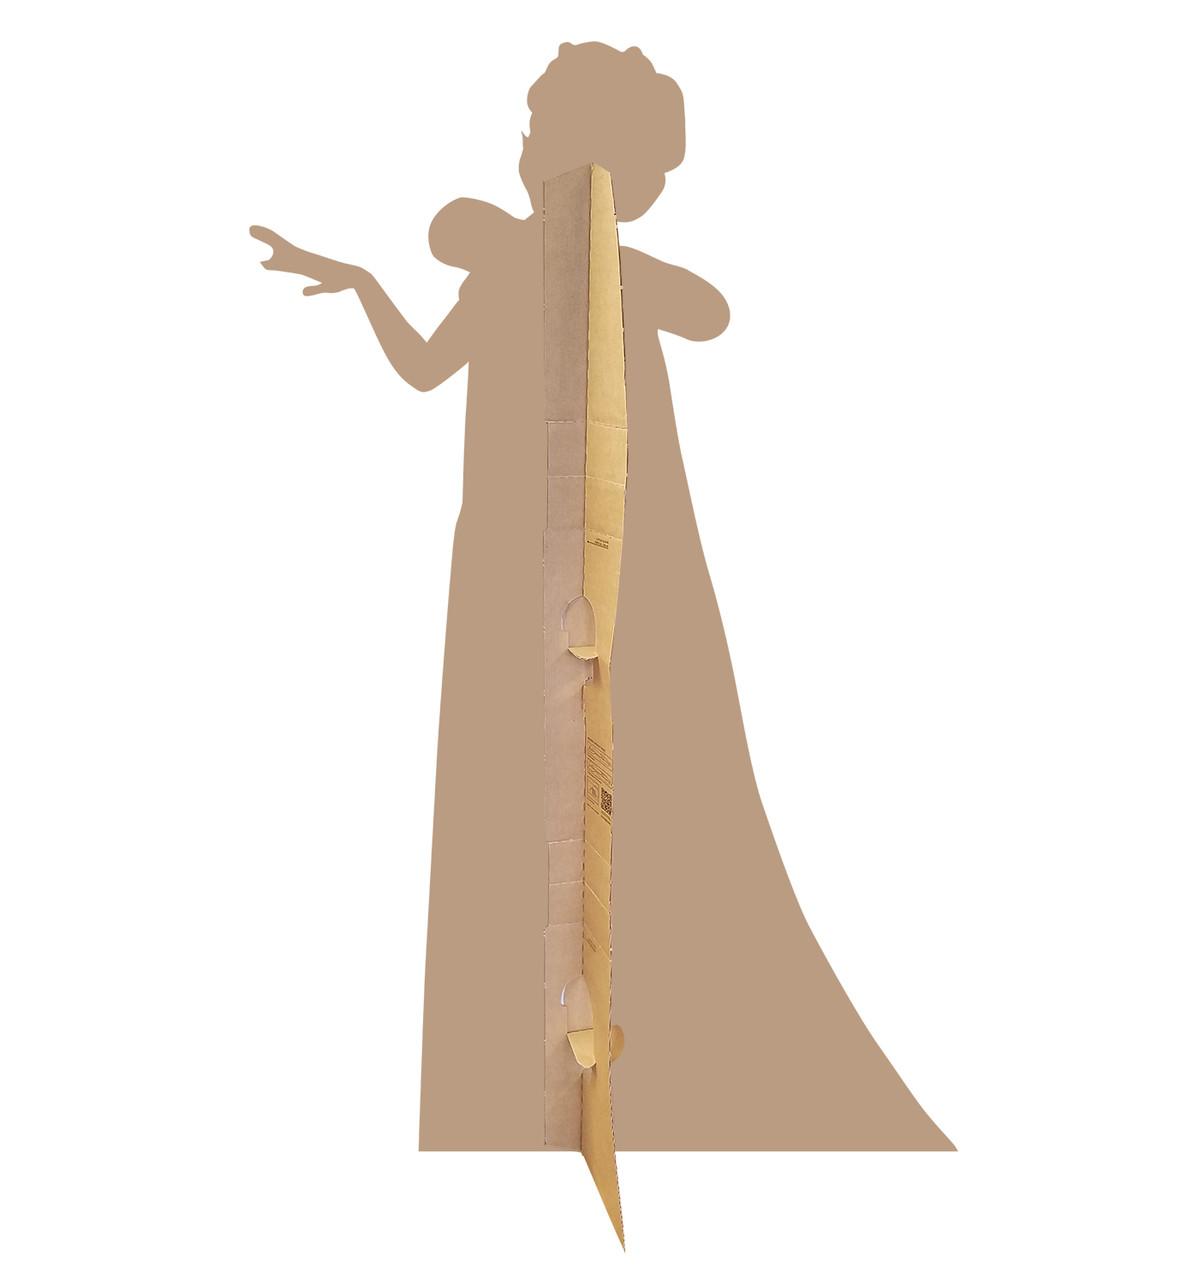 Elsa (Olafs Frozen Adventure) | Cardboard Cutout 2